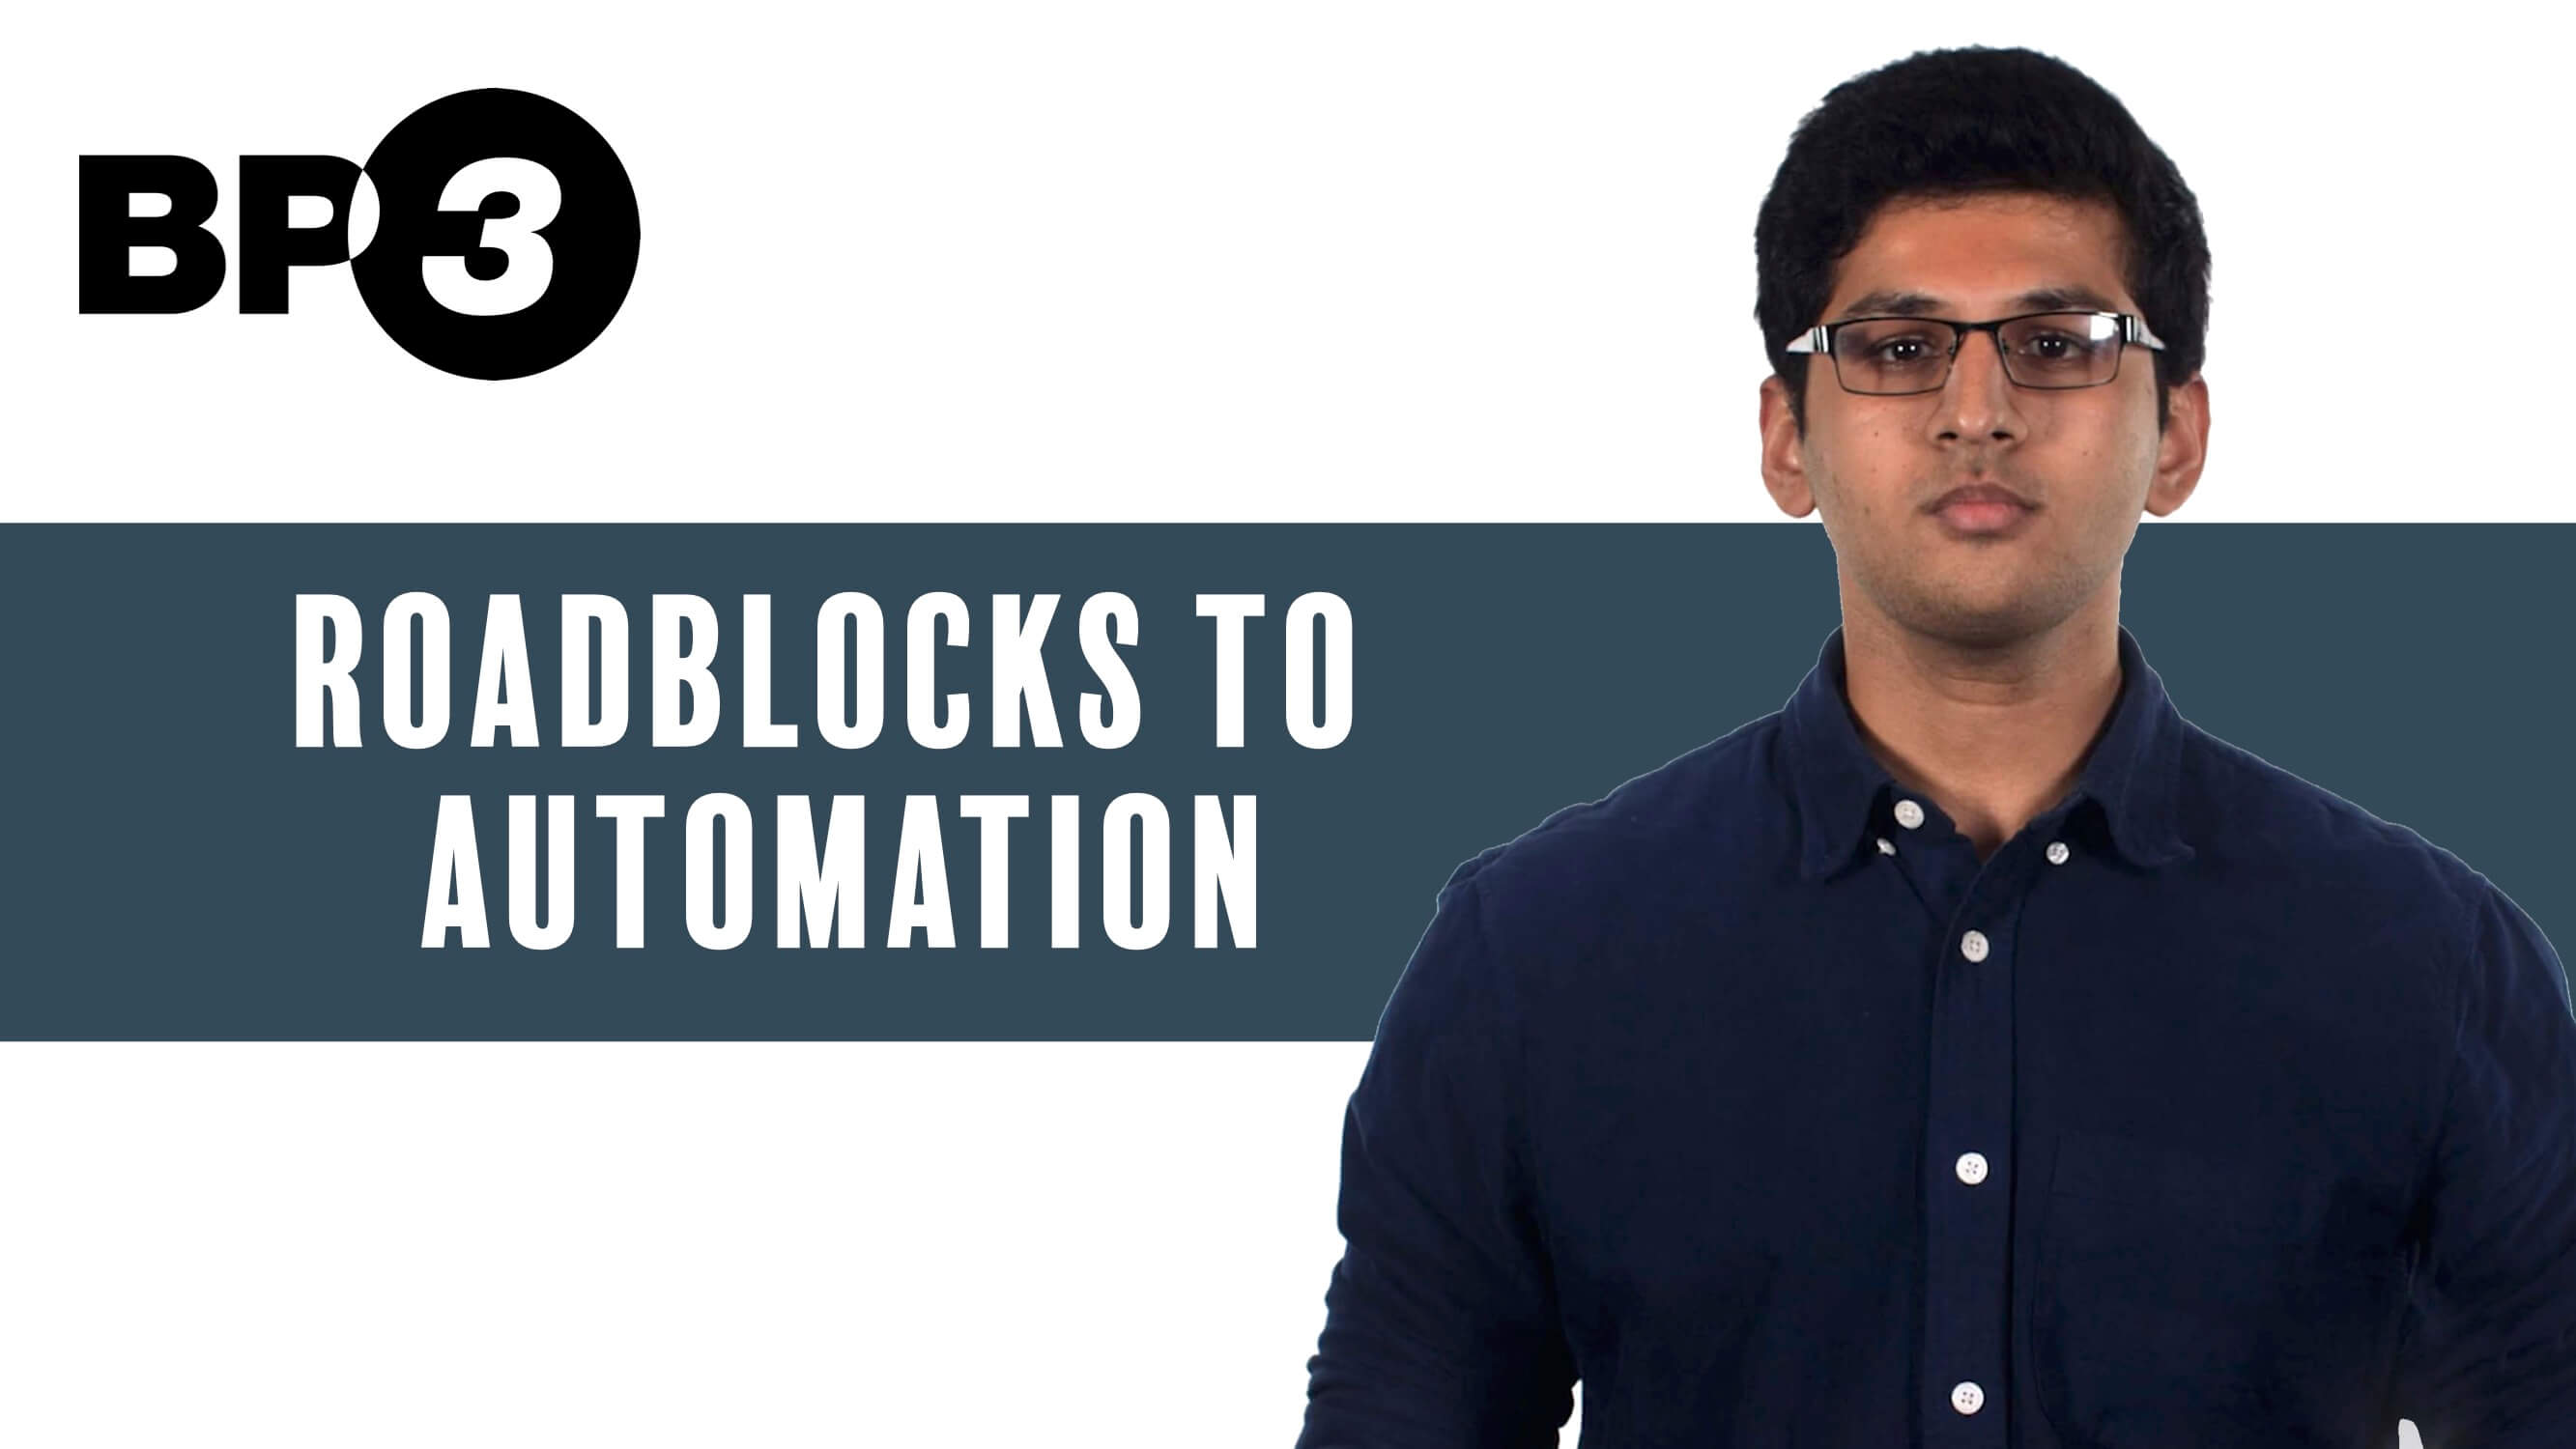 Roadblocks to Automation